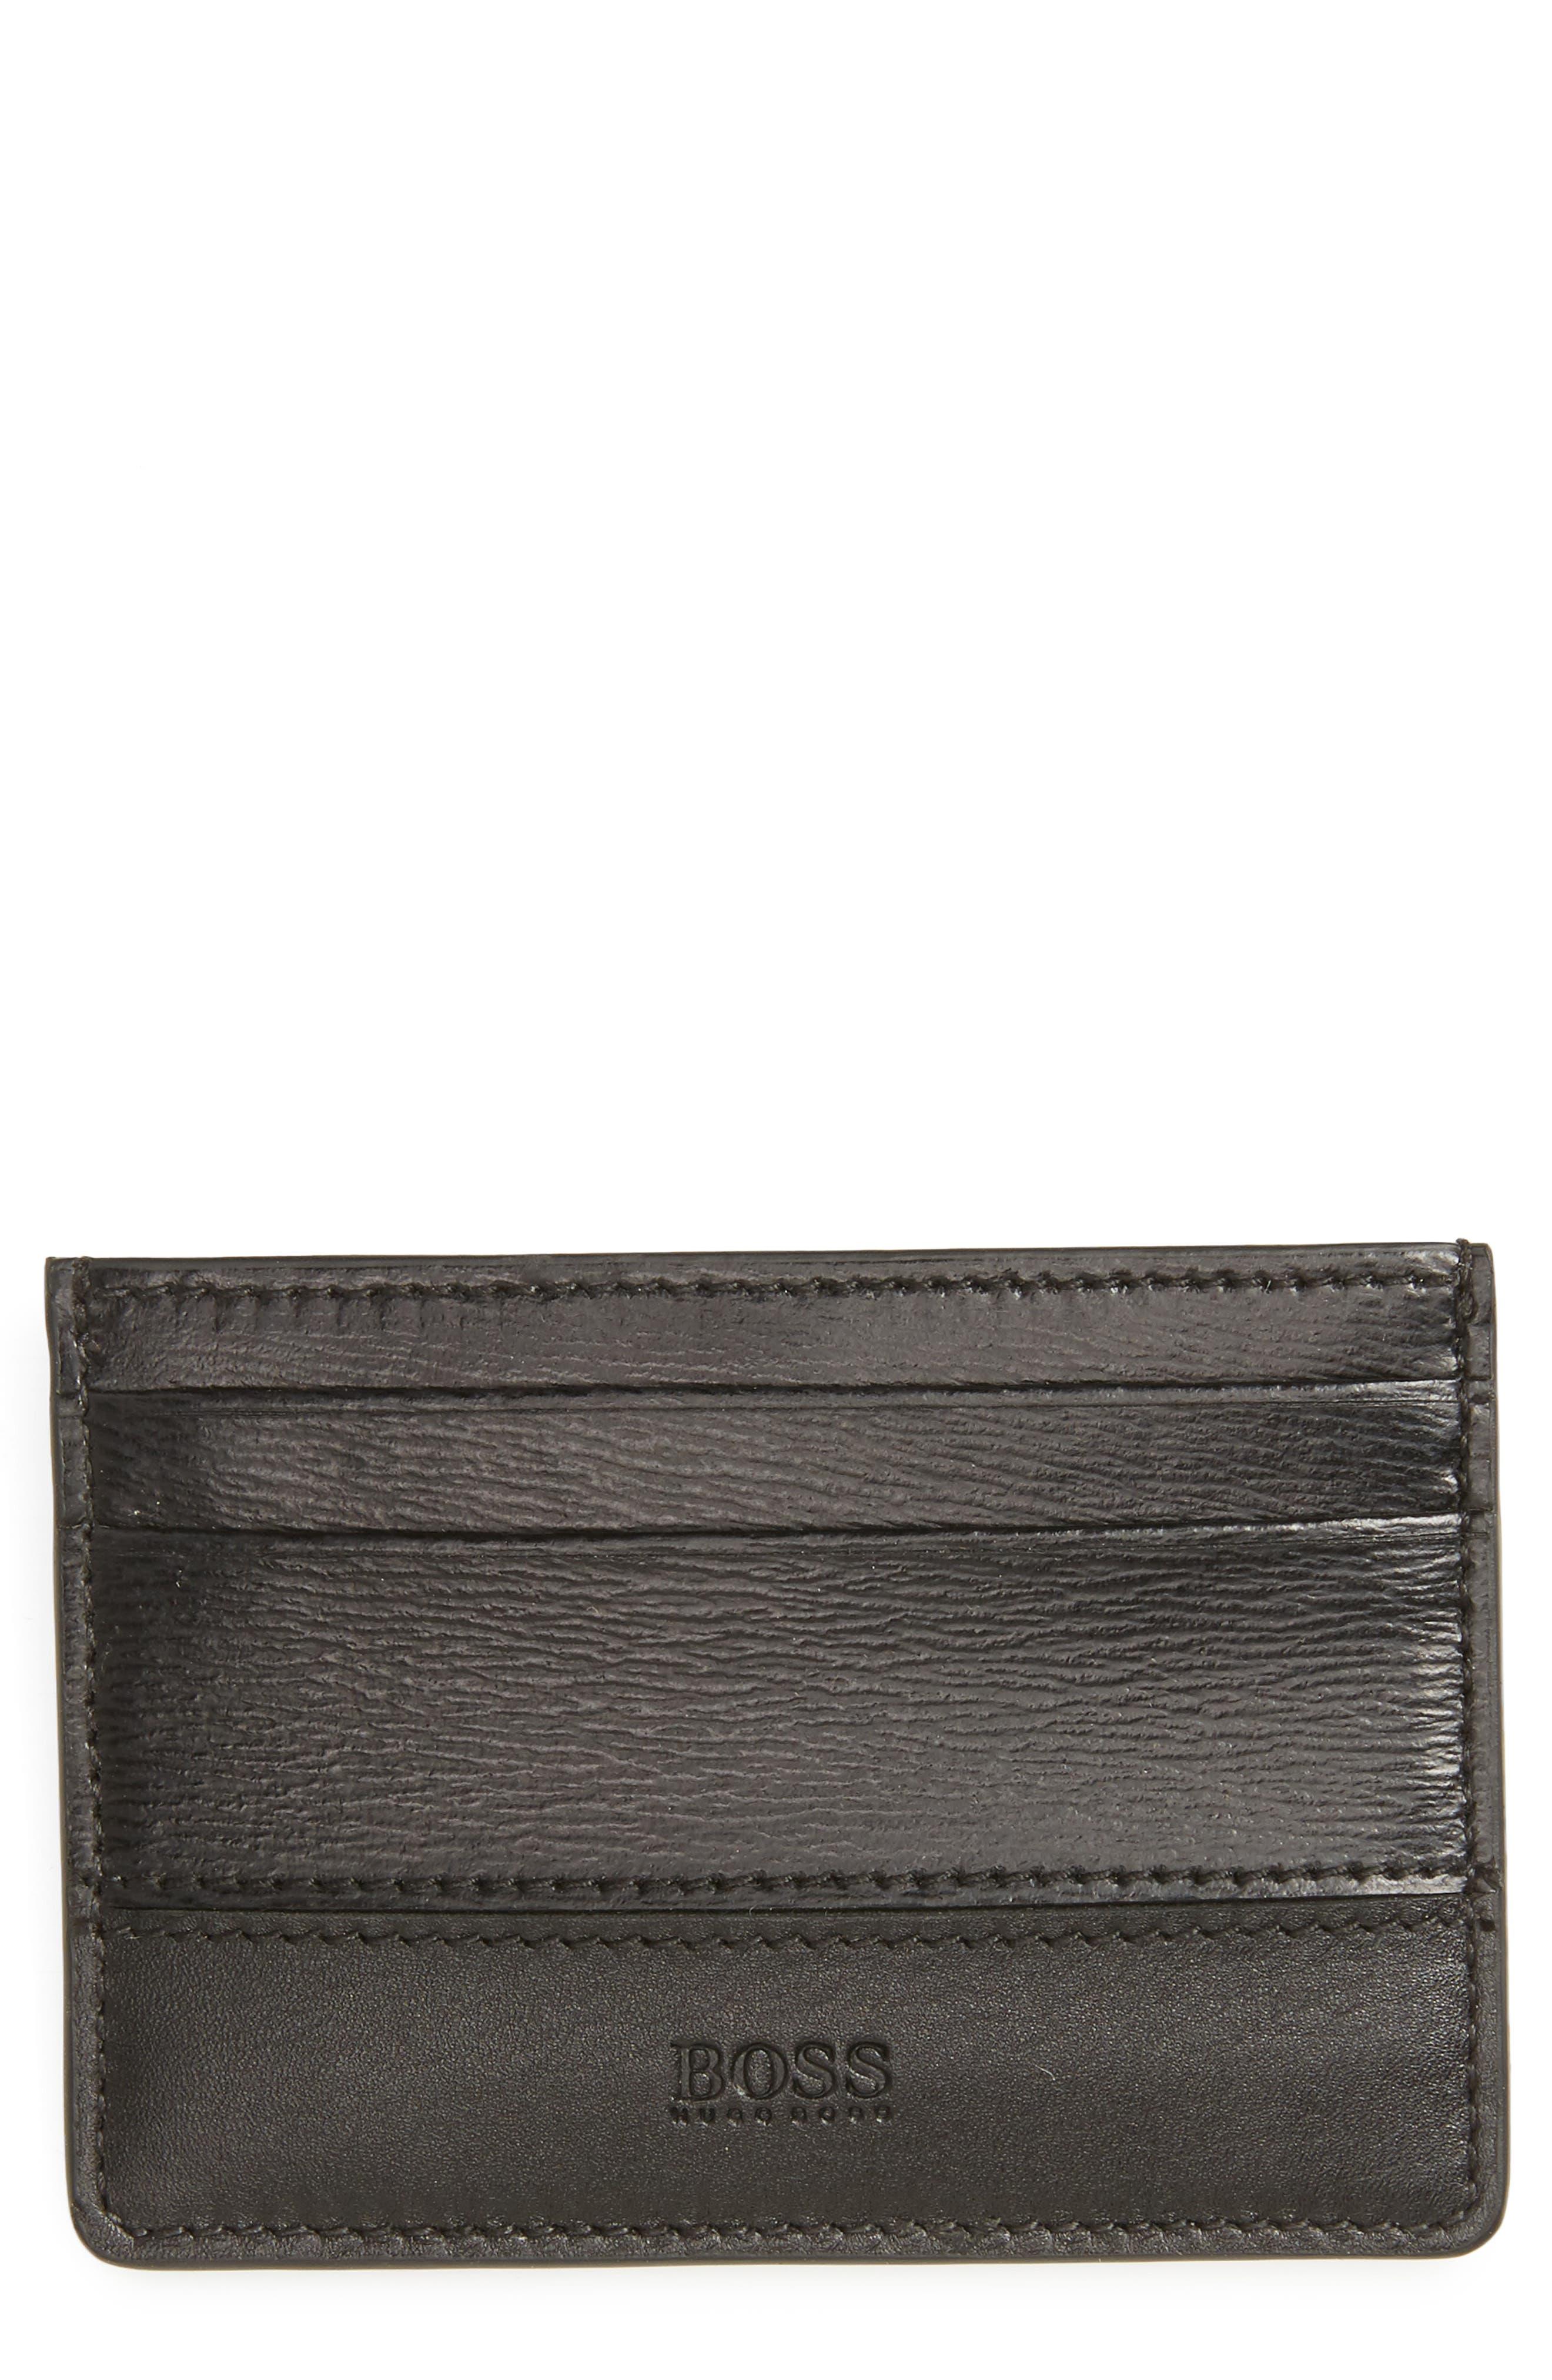 Focus Leather Card Case,                         Main,                         color, Black